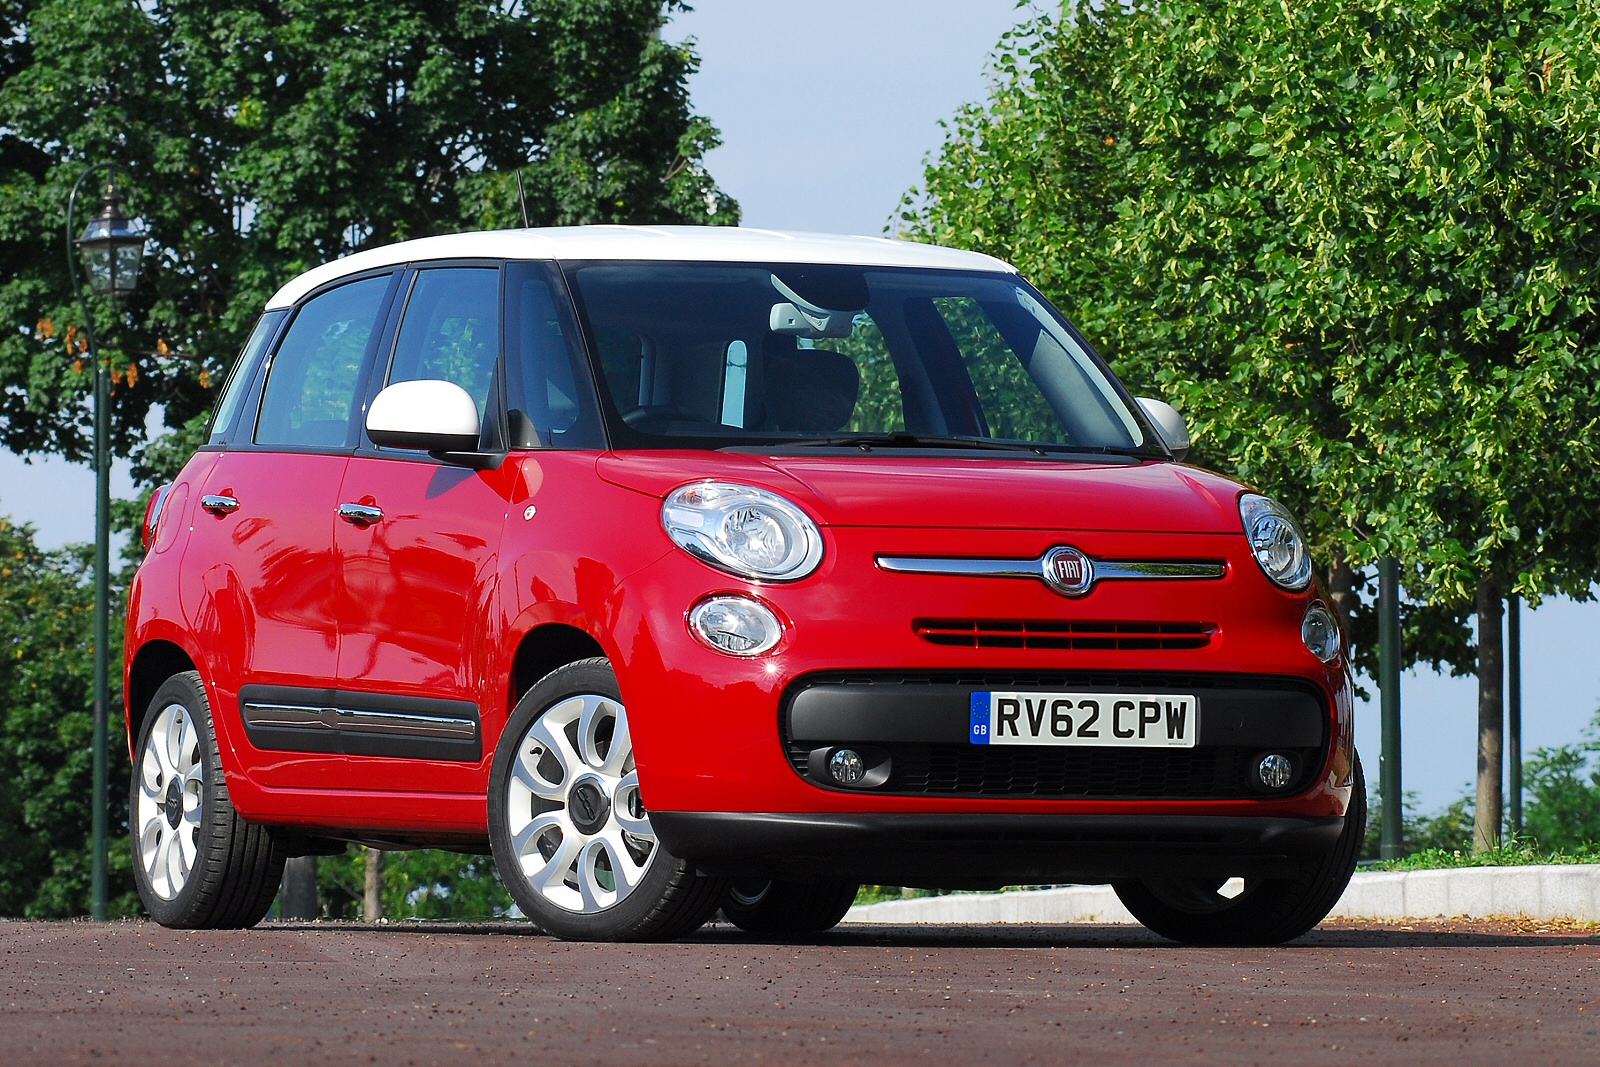 Fiat Lease UkNew Fiat Deals Best Deals From Uk Fiat - Fiat 500 lease deal